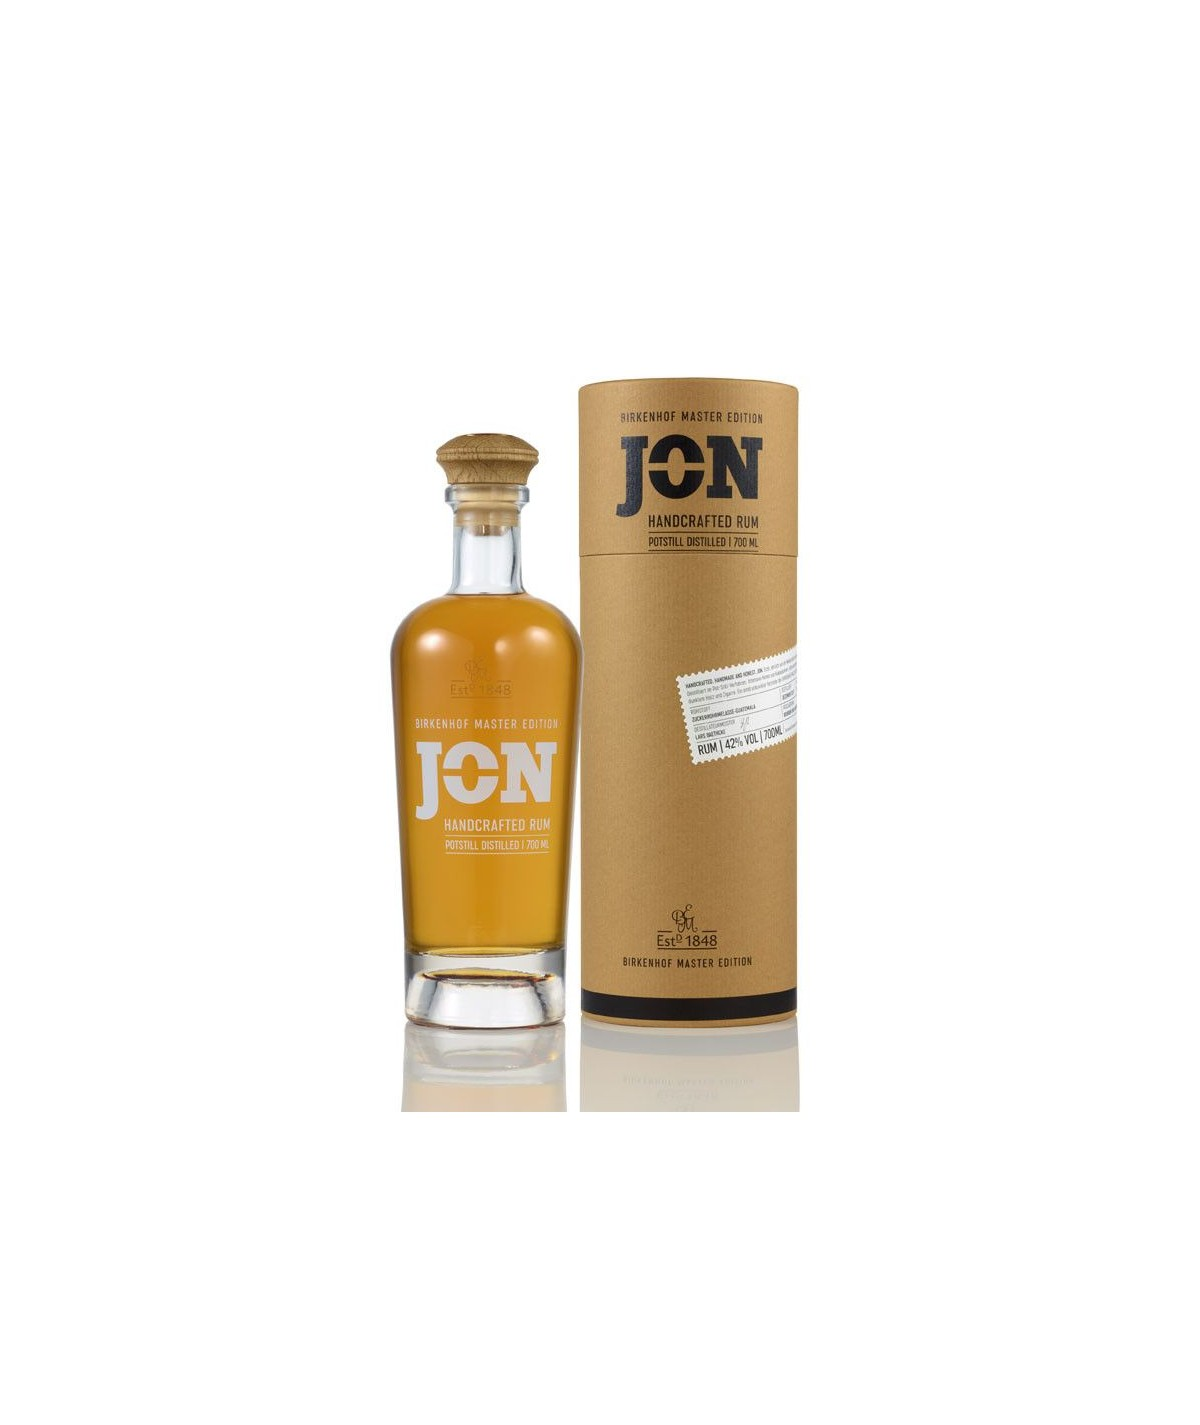 JON Handcrafted Rhum 0,7l